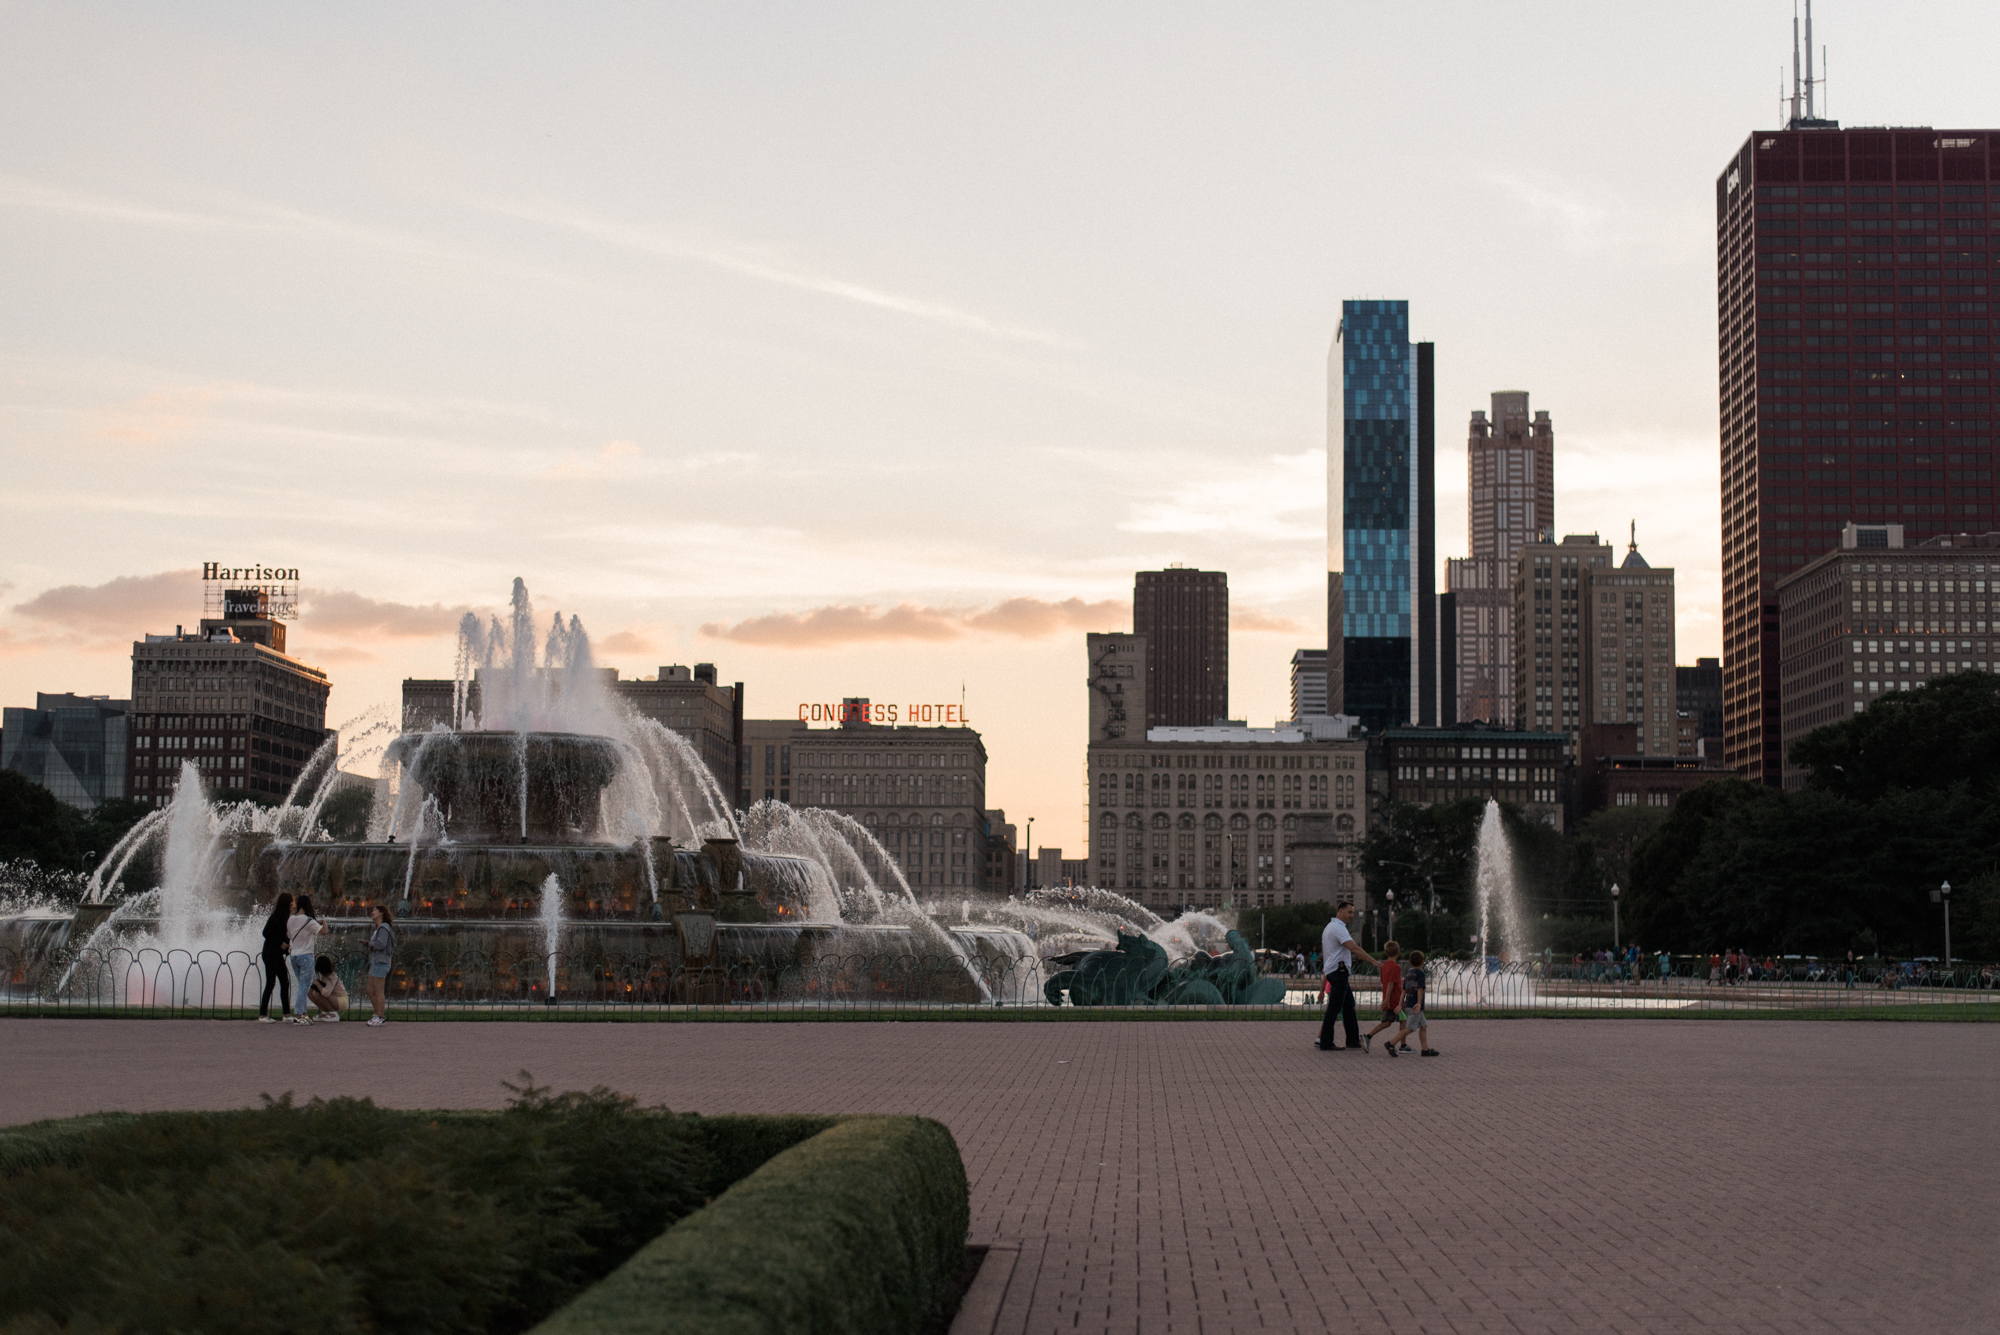 Chelsea Bliefernicht | Buckingham Fountain | Chicago Photographer